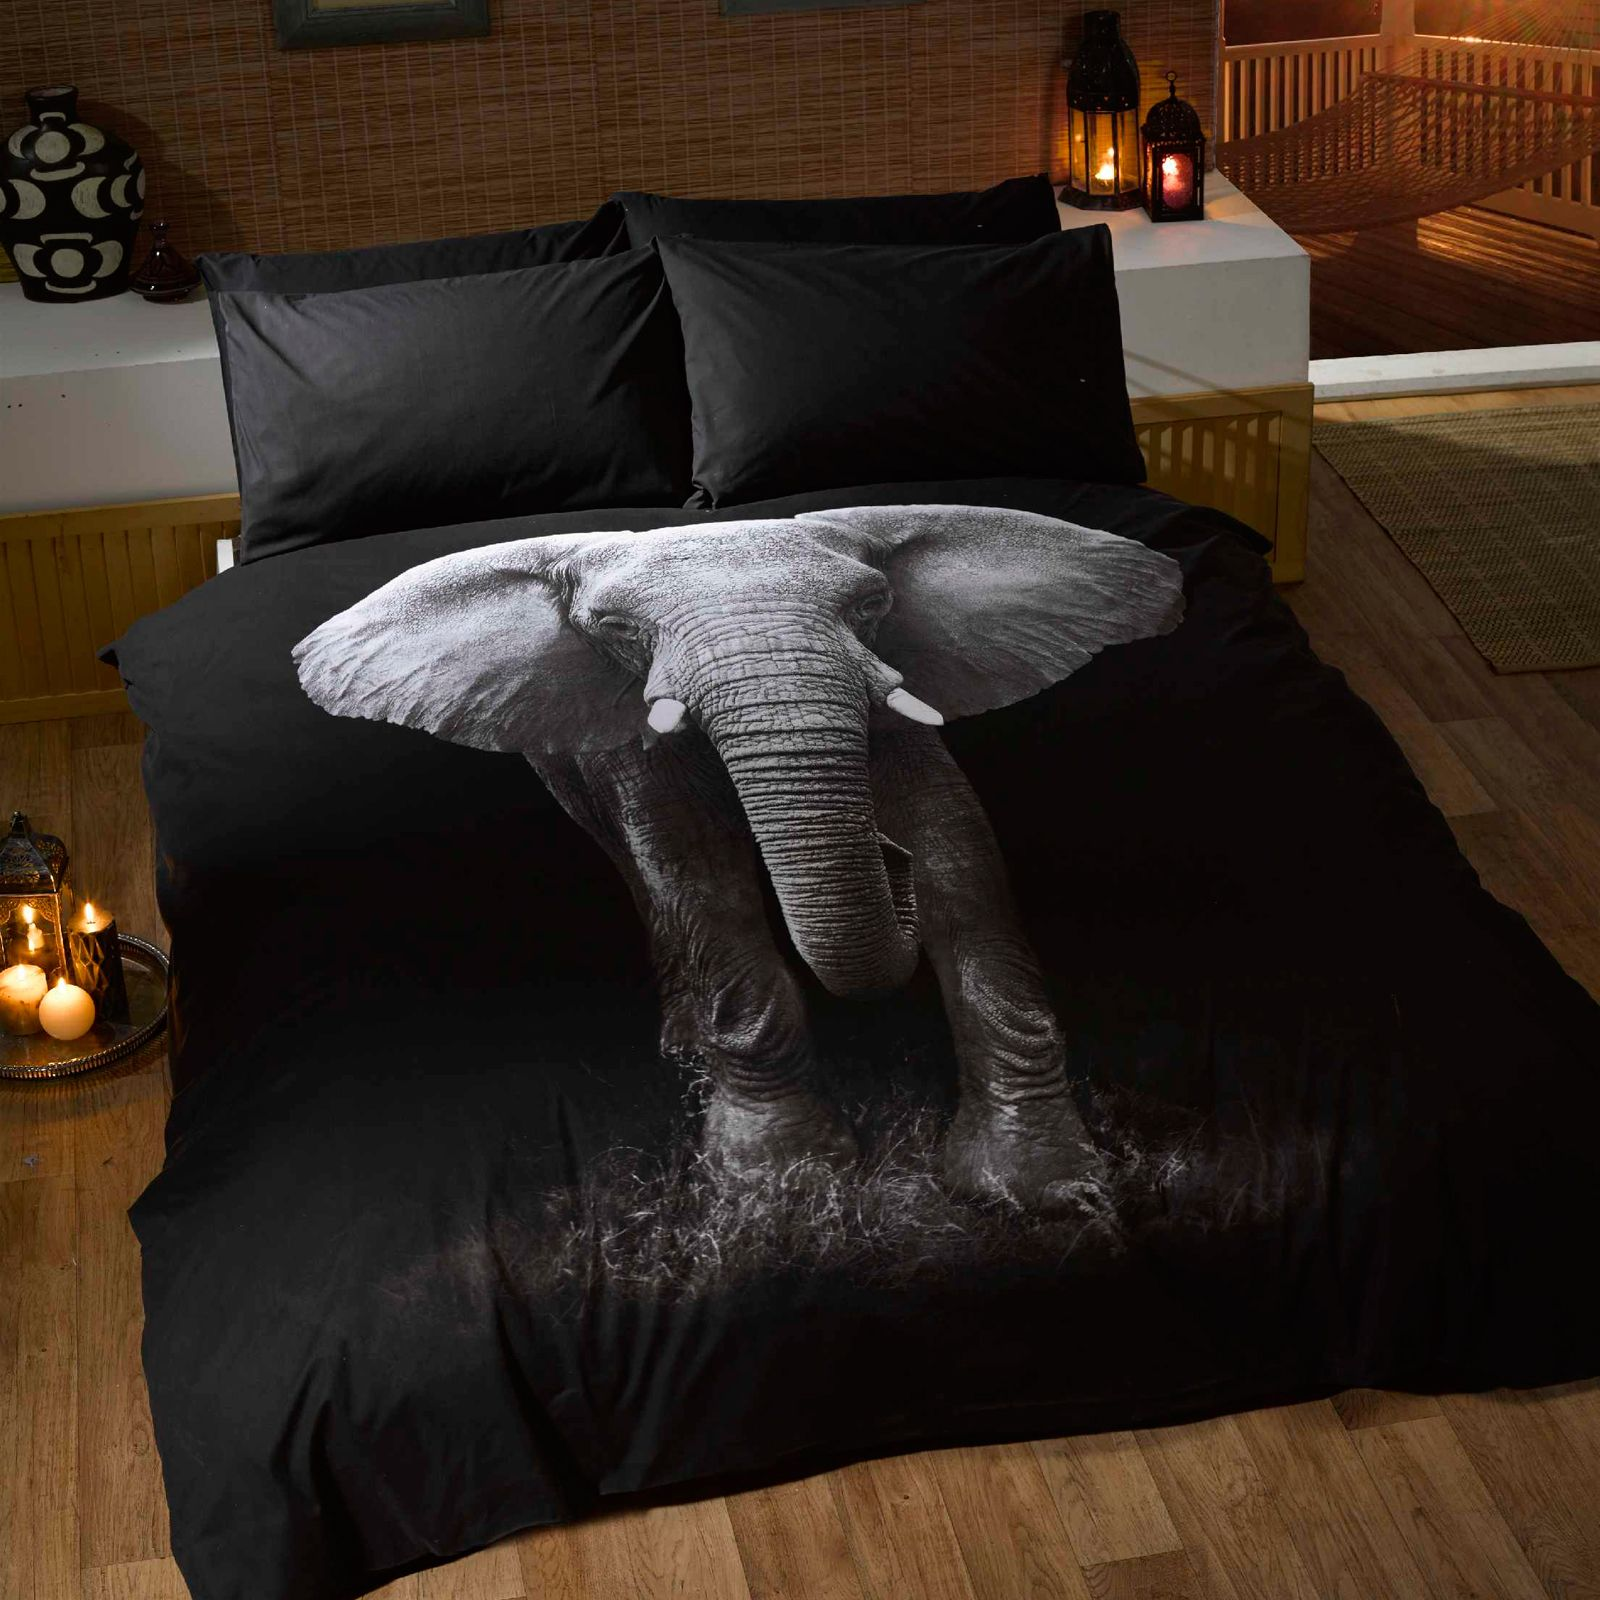 animaux photo housse de couette ensembles husky tigre ours cerf simple ebay. Black Bedroom Furniture Sets. Home Design Ideas